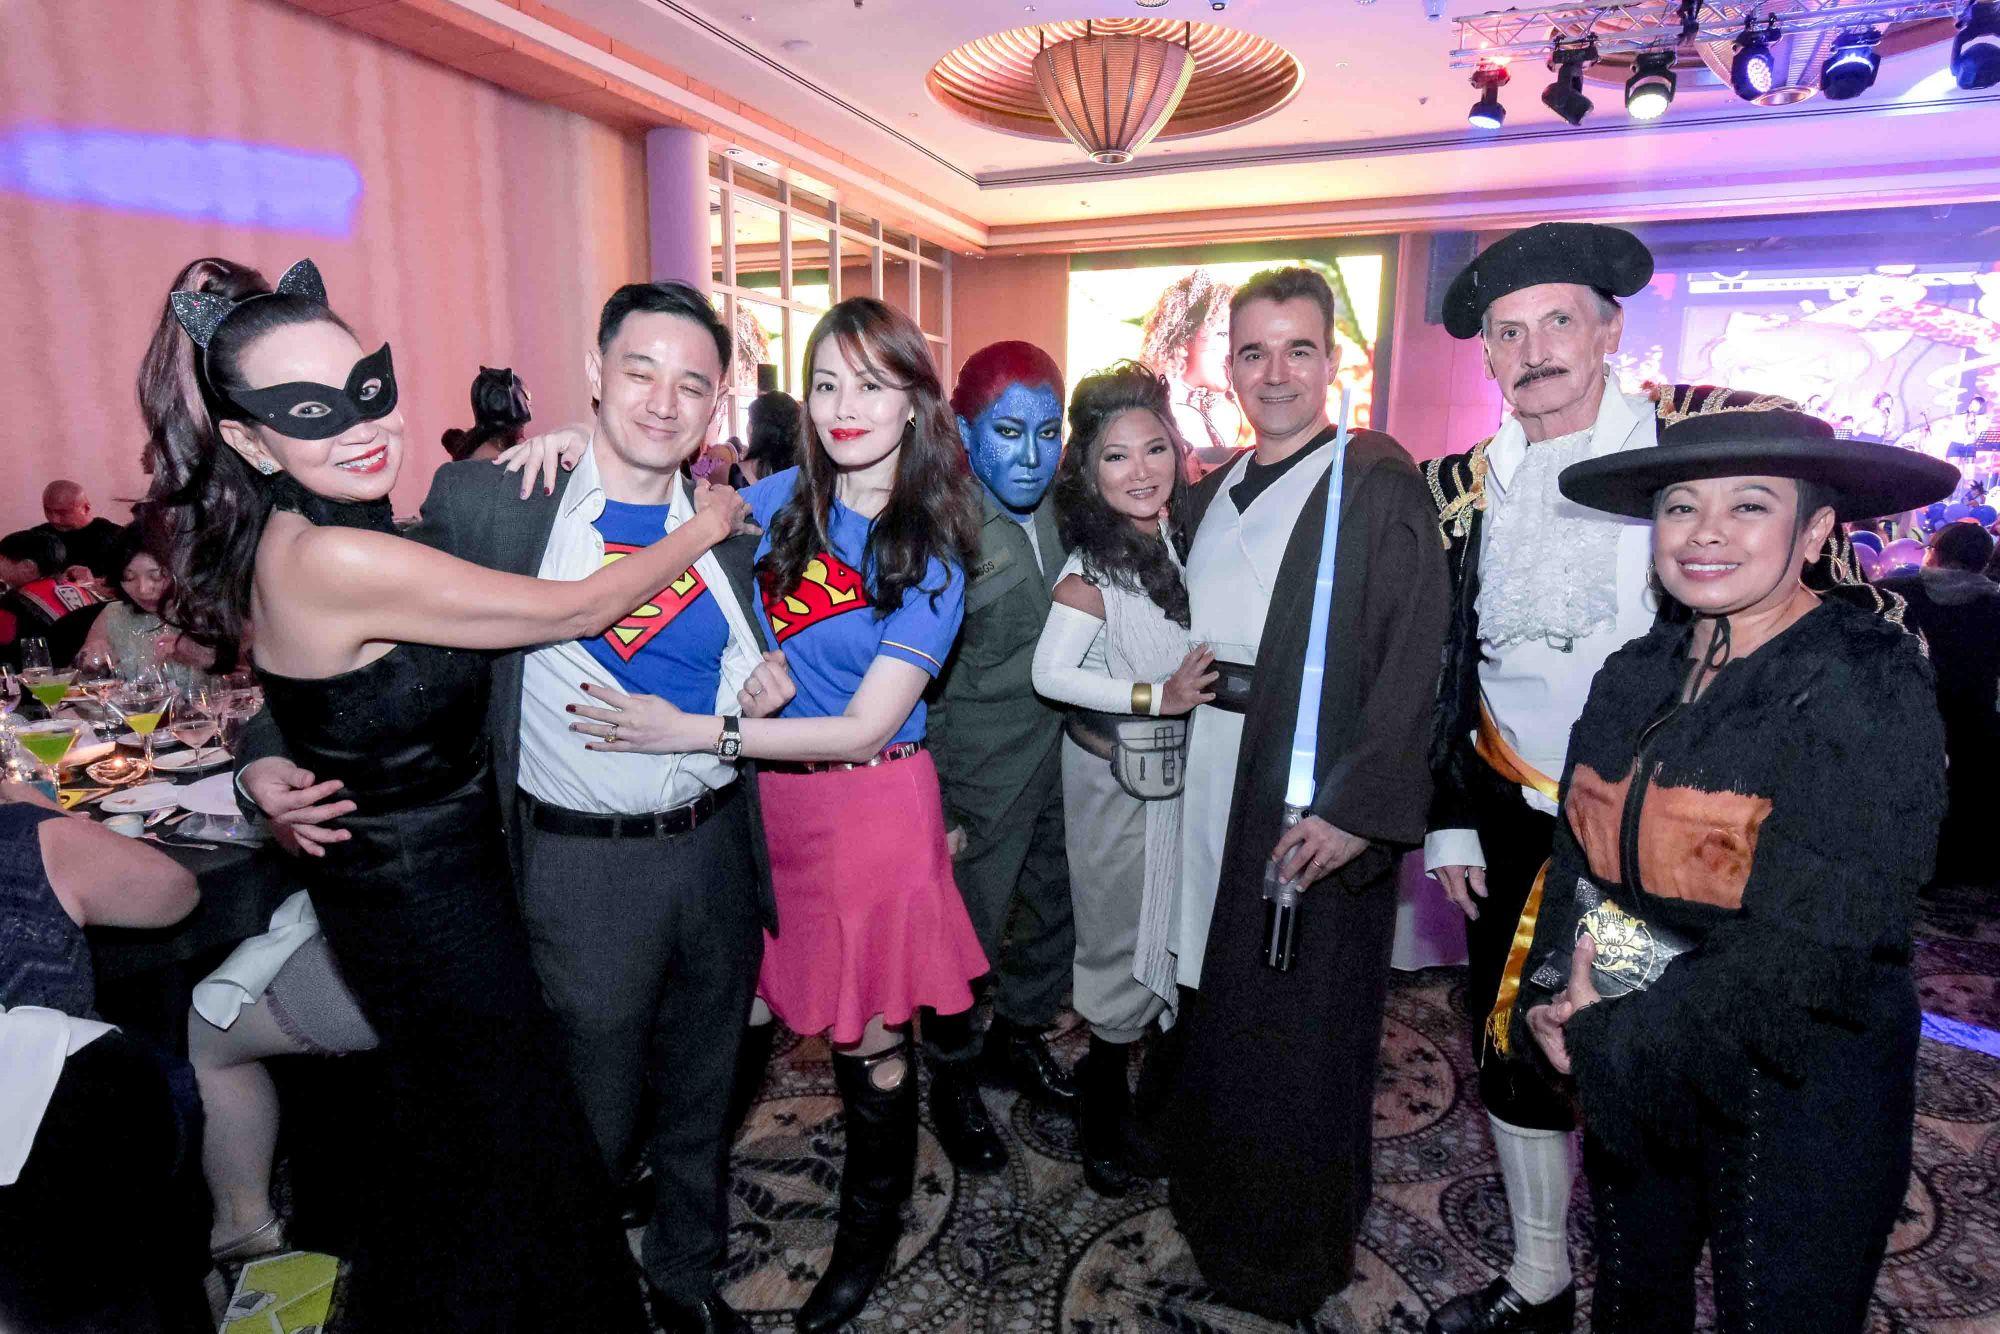 Celeste Basapa, Benjamin Kim, Serene Tan, Desmond Lim, Audrey Mico, Oscar Mico